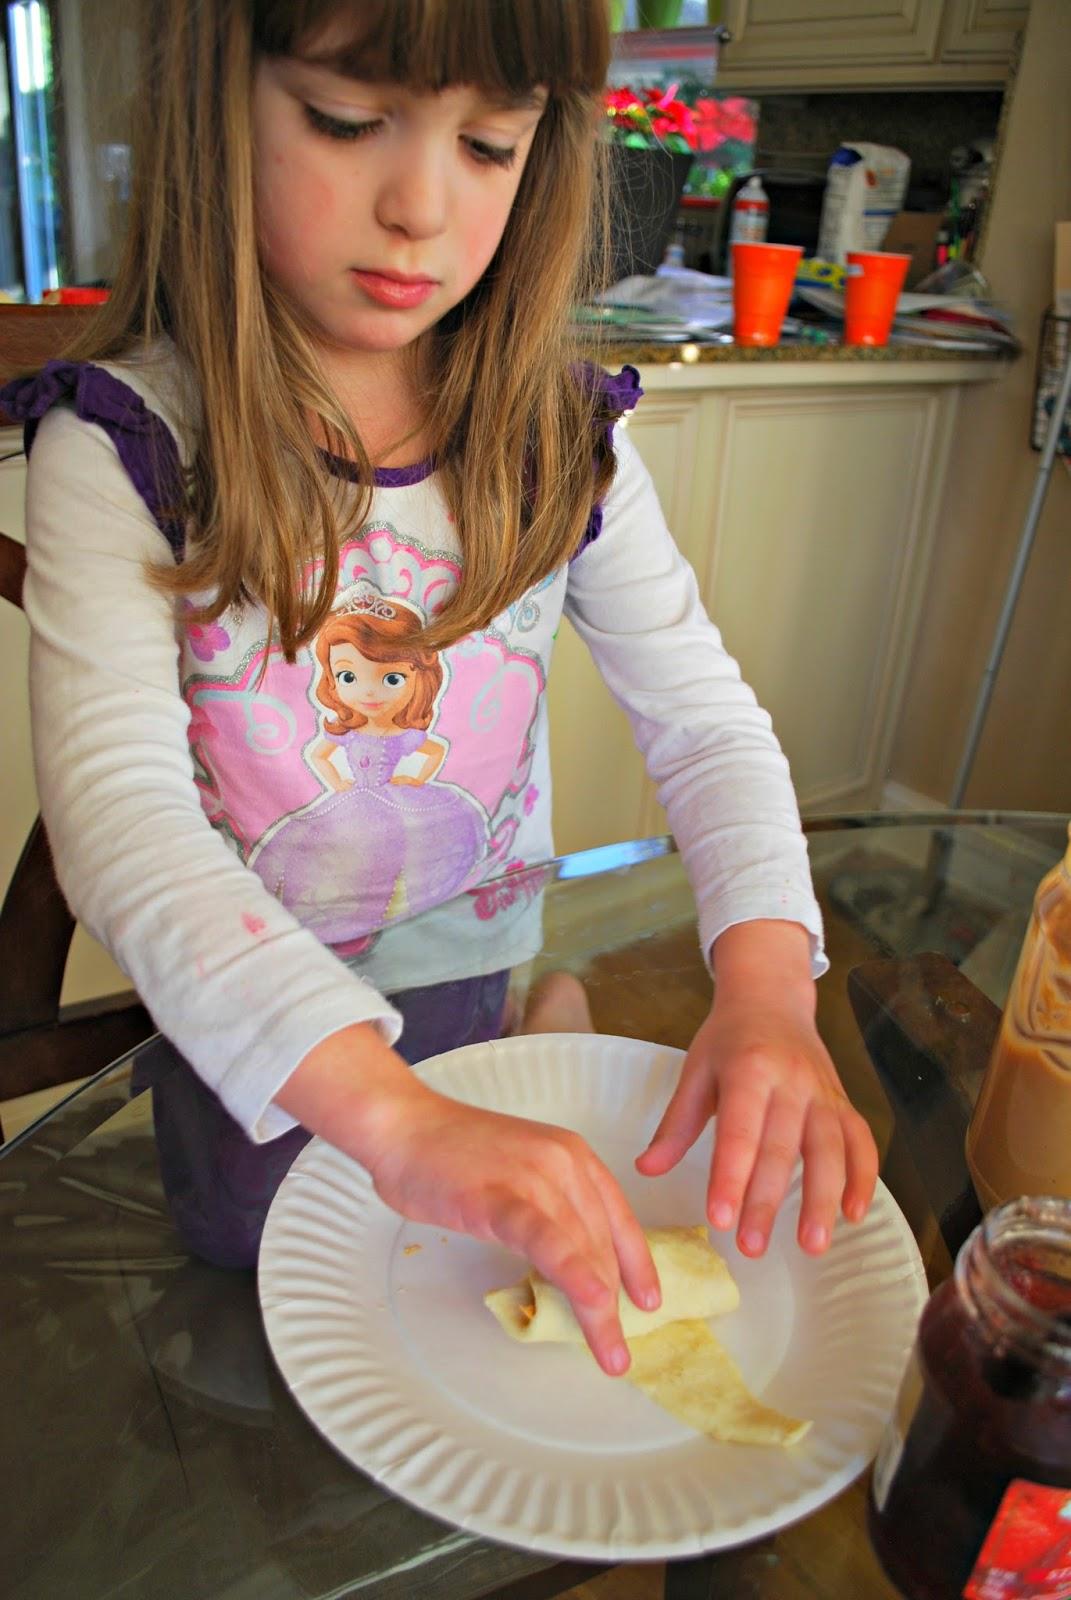 easy crescent roll recipes